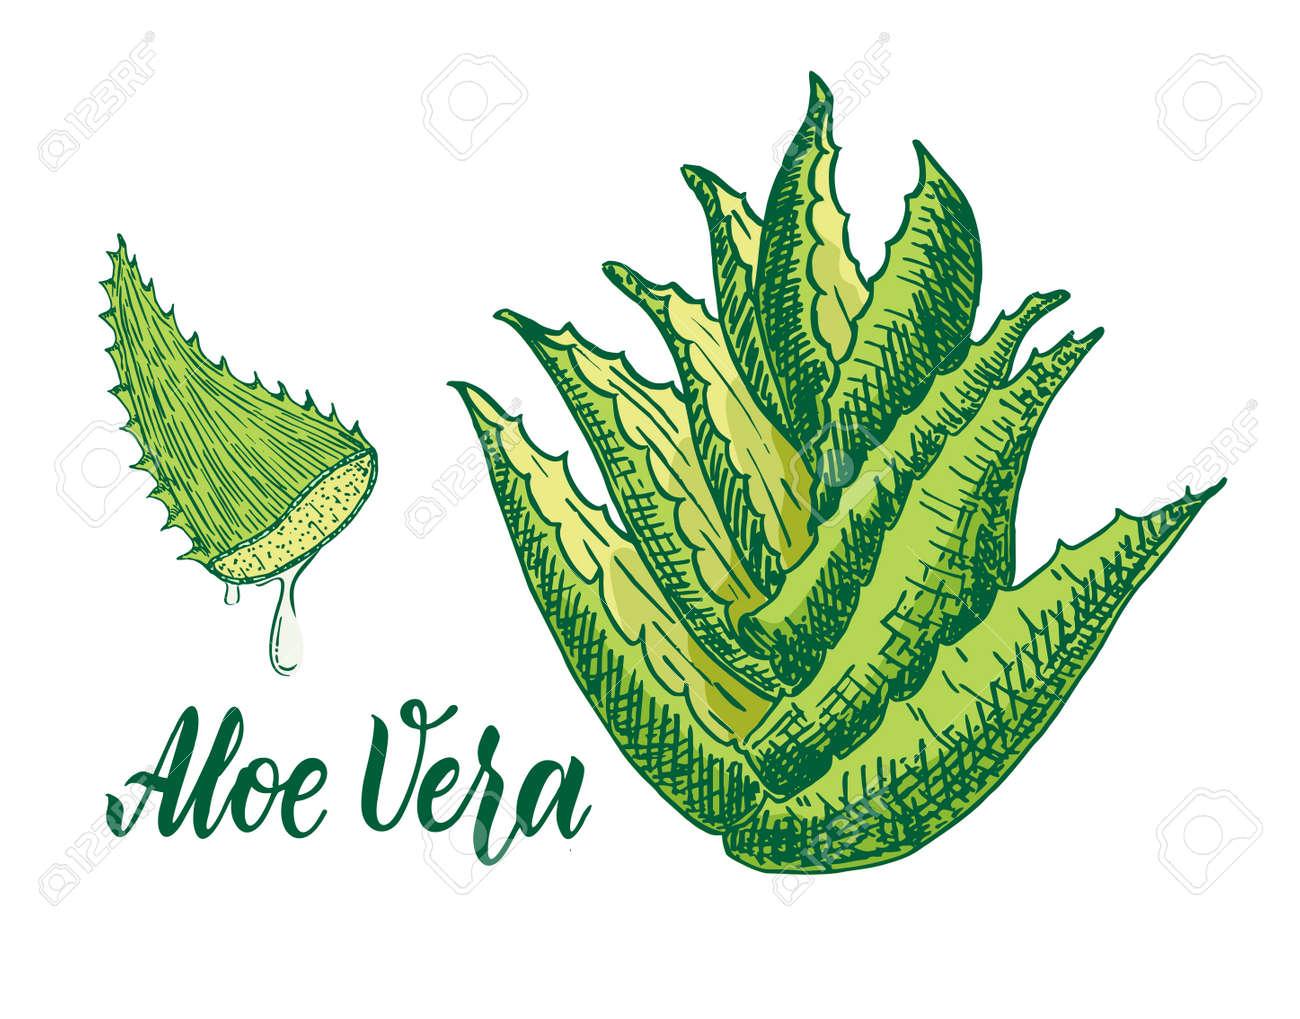 Vector hand drawn botanical aloe vera. Aloe plant, branch, aloe juice sketch. Collection with engraving. - 169743679